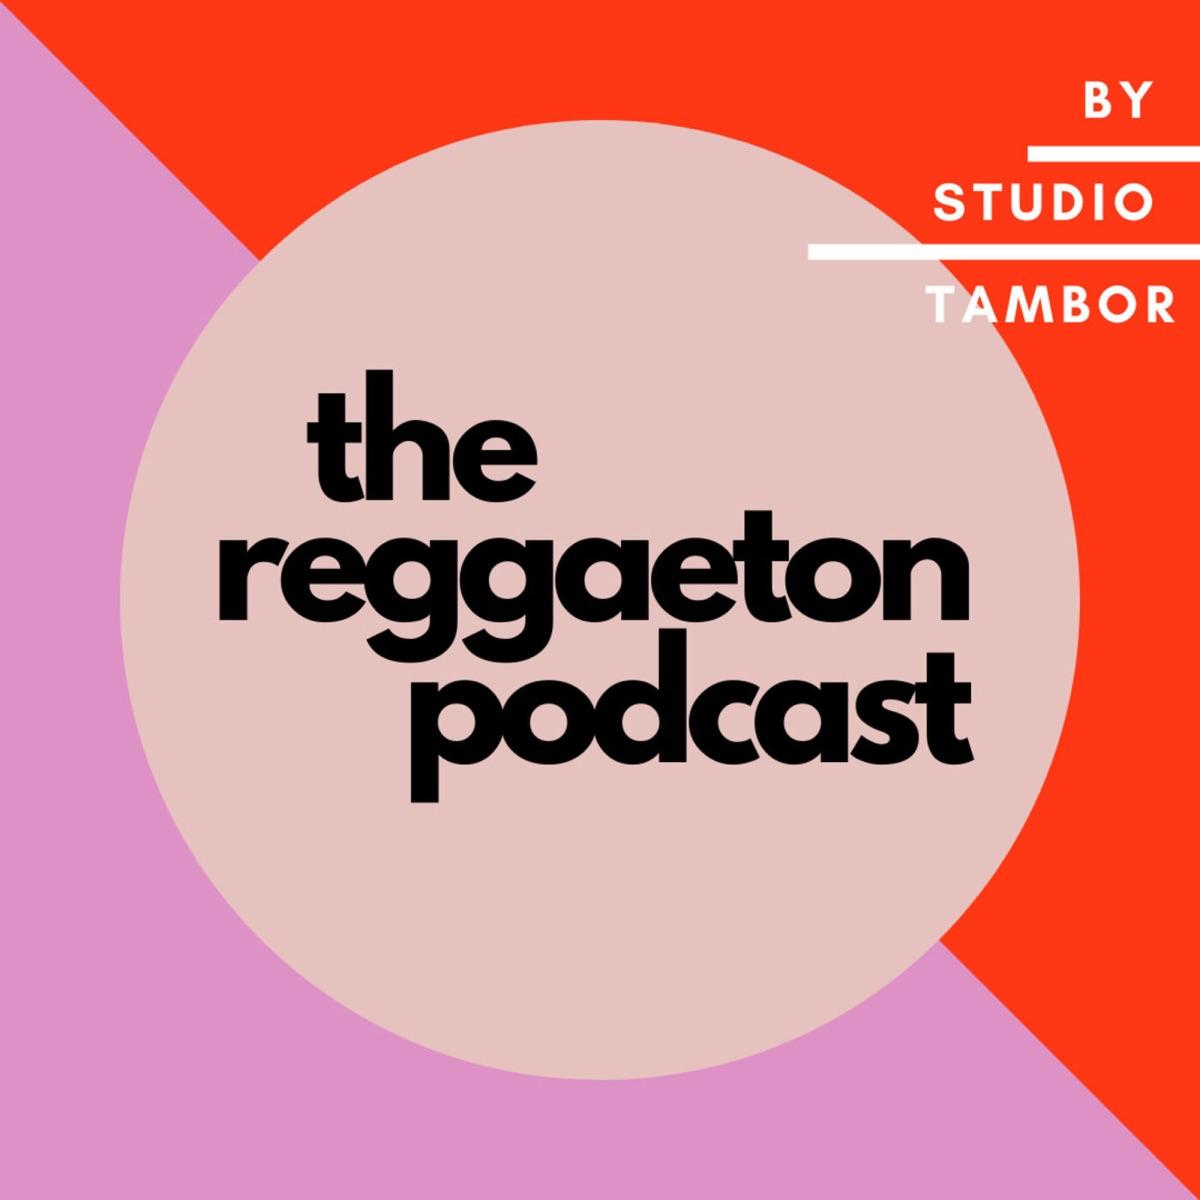 The Reggaeton Podcast